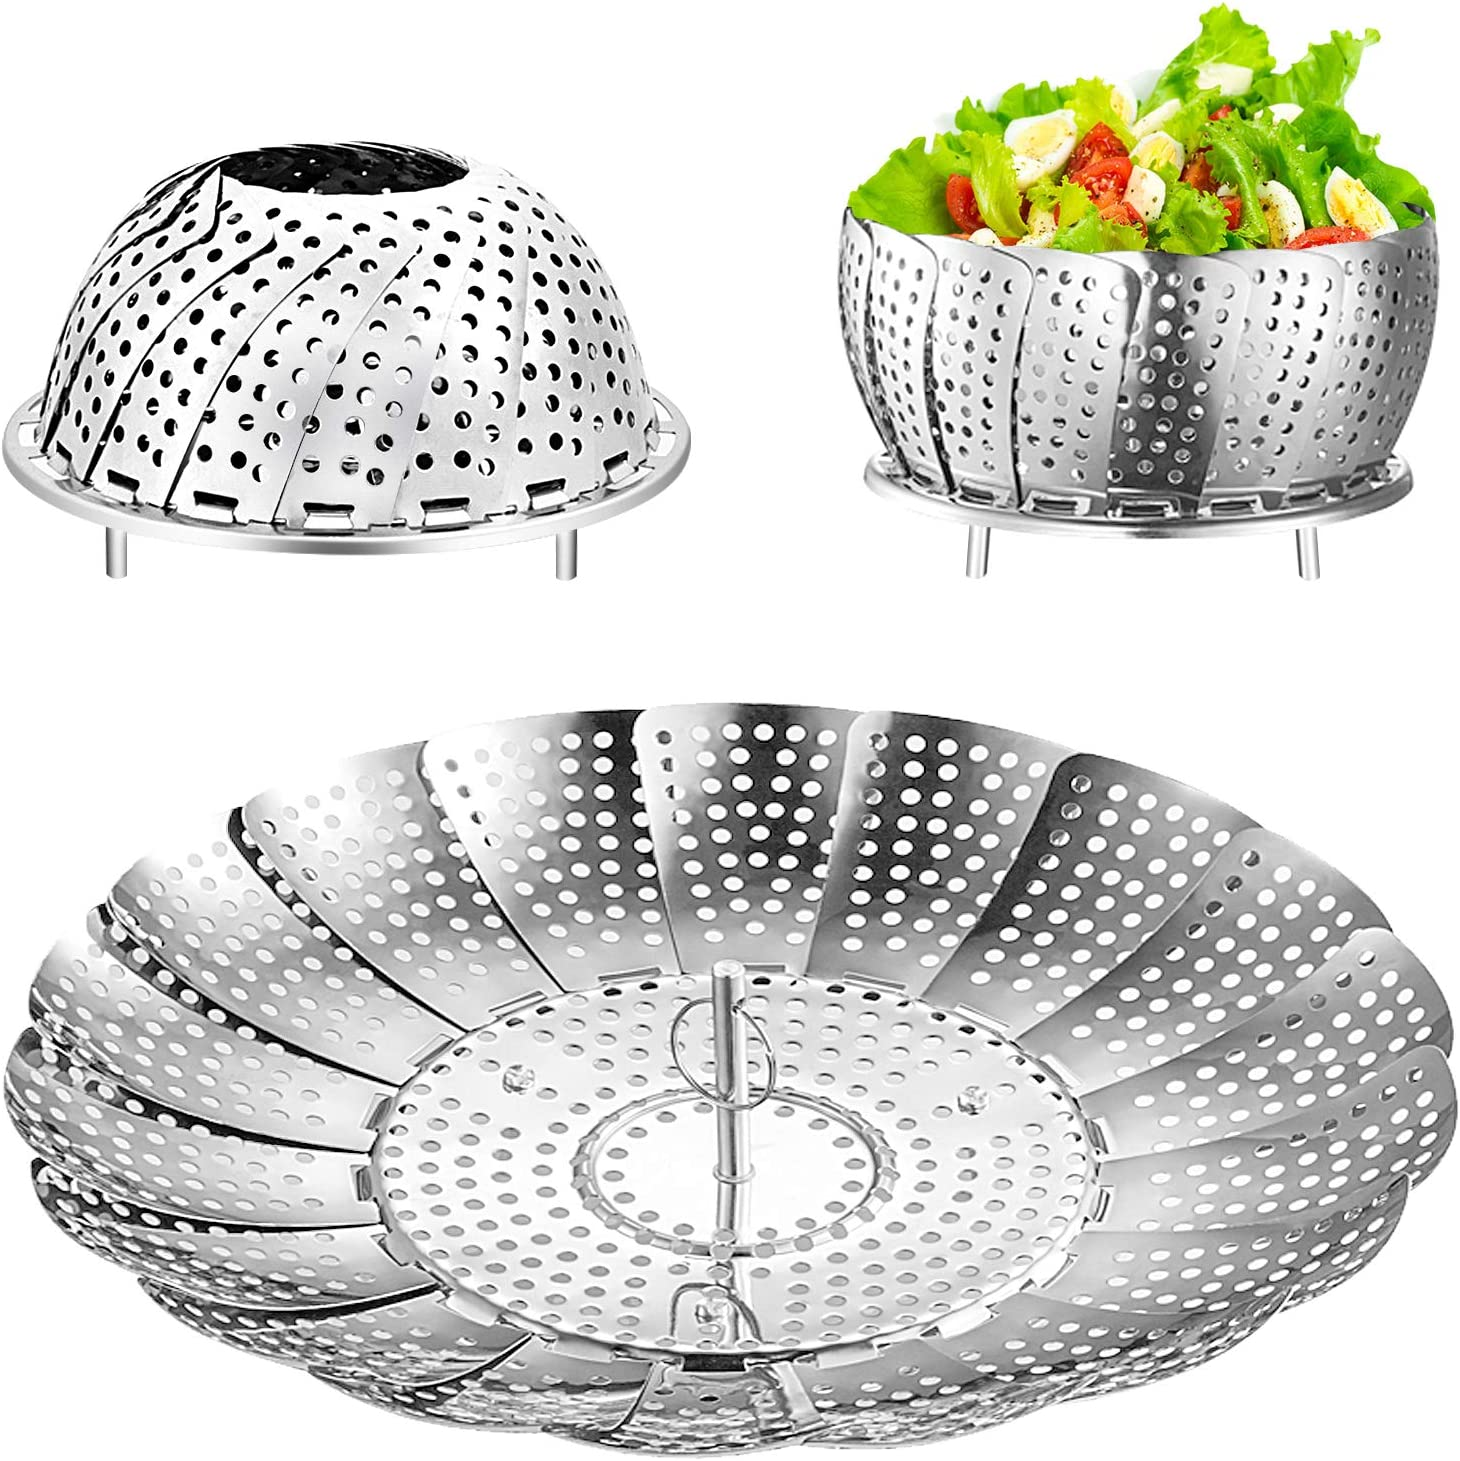 Steamer Basket, GOOGEEK Vegetable Steamer Basket, Folding Stainless Steel Food Steamer for Instant Pot, Steamer Baskets for Cooking Veggie Fish Seafood, Expandable to Fit Various Size Pot (5